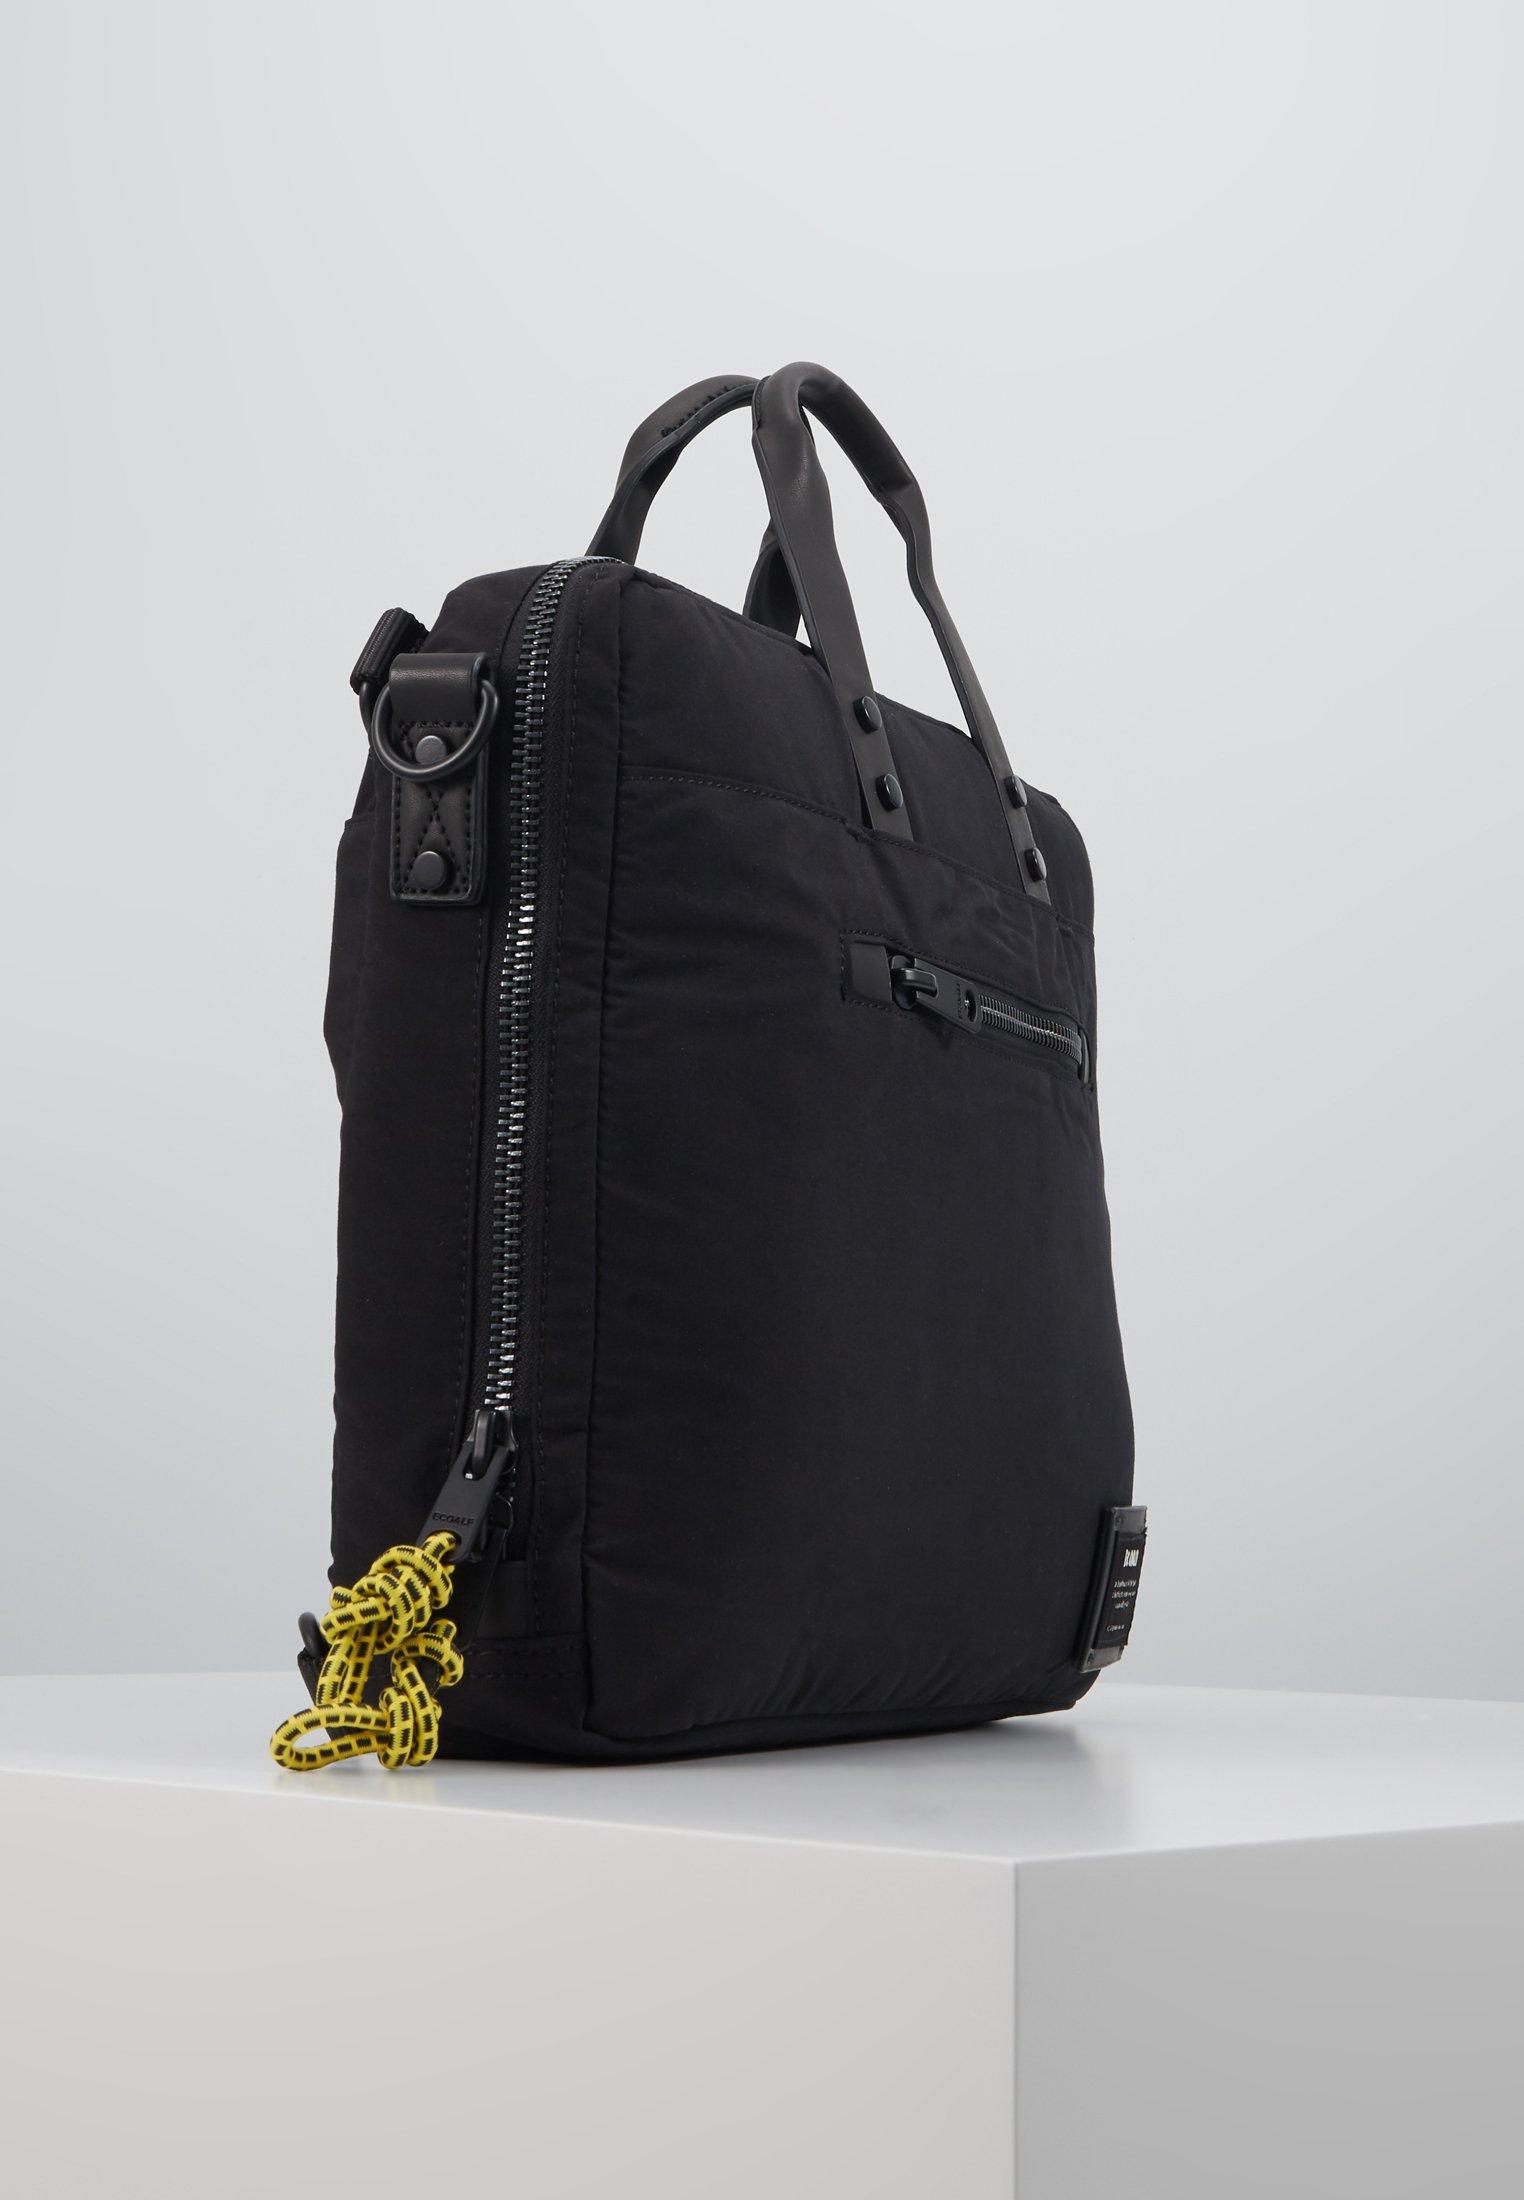 Ecoalf Lion Briefcase - Mallette Black